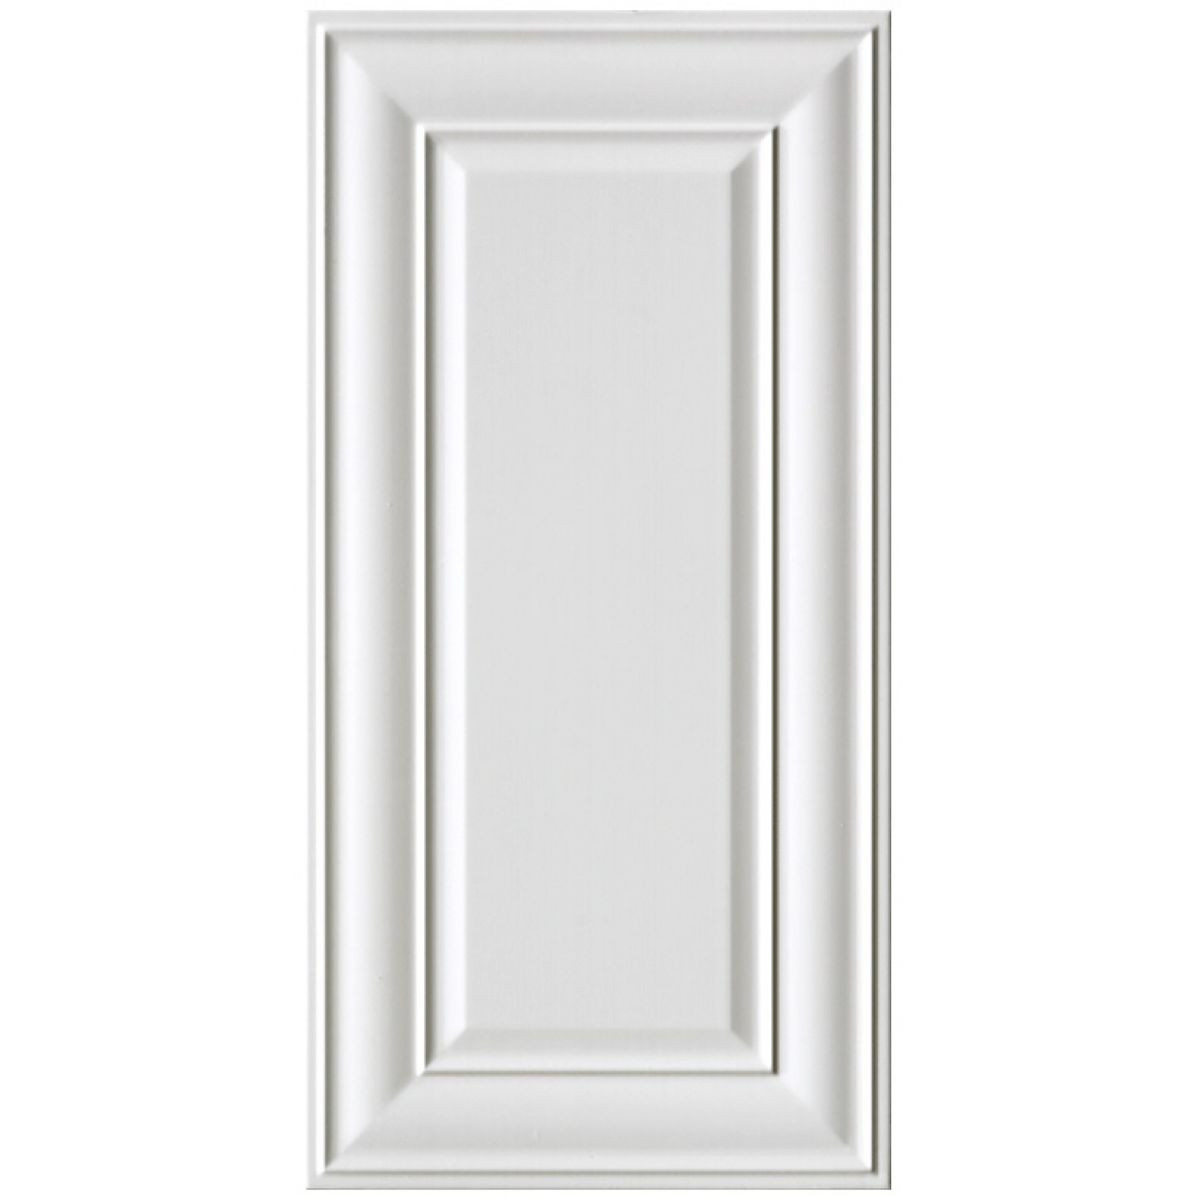 Imperial Bathrooms Edwardian Panel Tile White 30 X 60cm